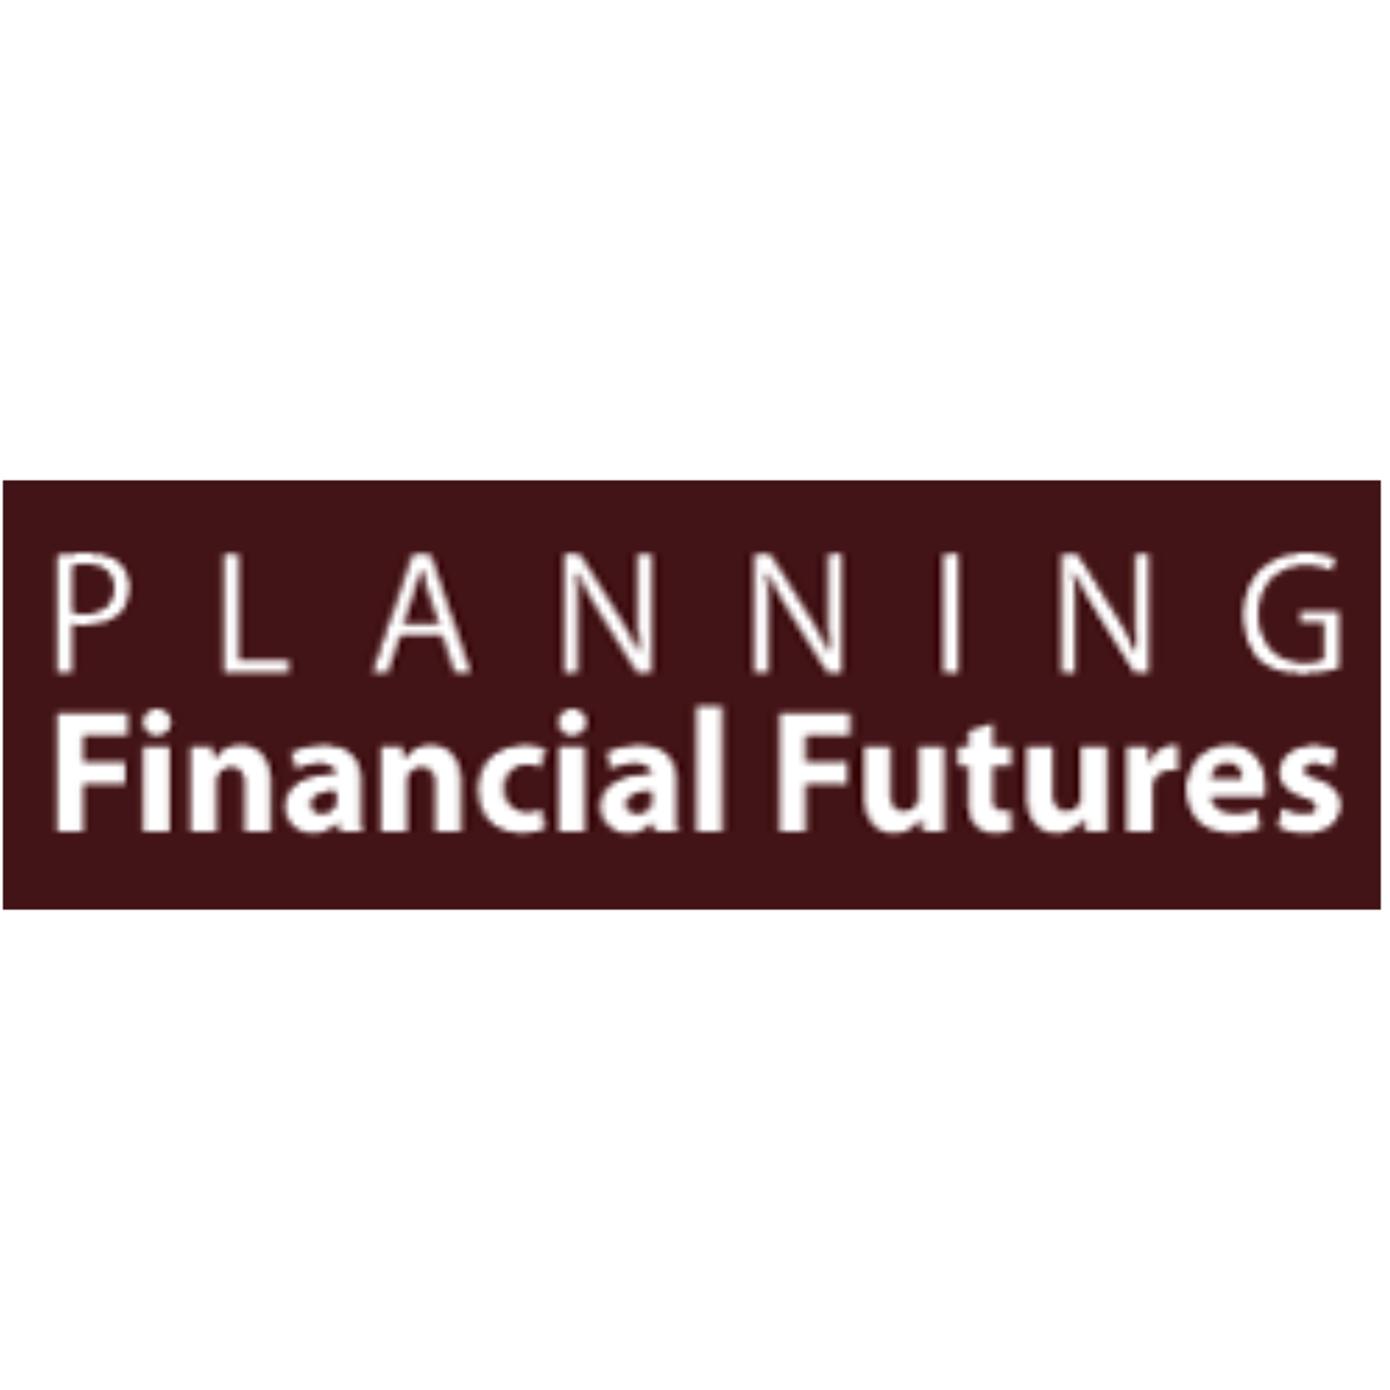 Jeffrey C. Lewis - Planning Financial Futures, Inc